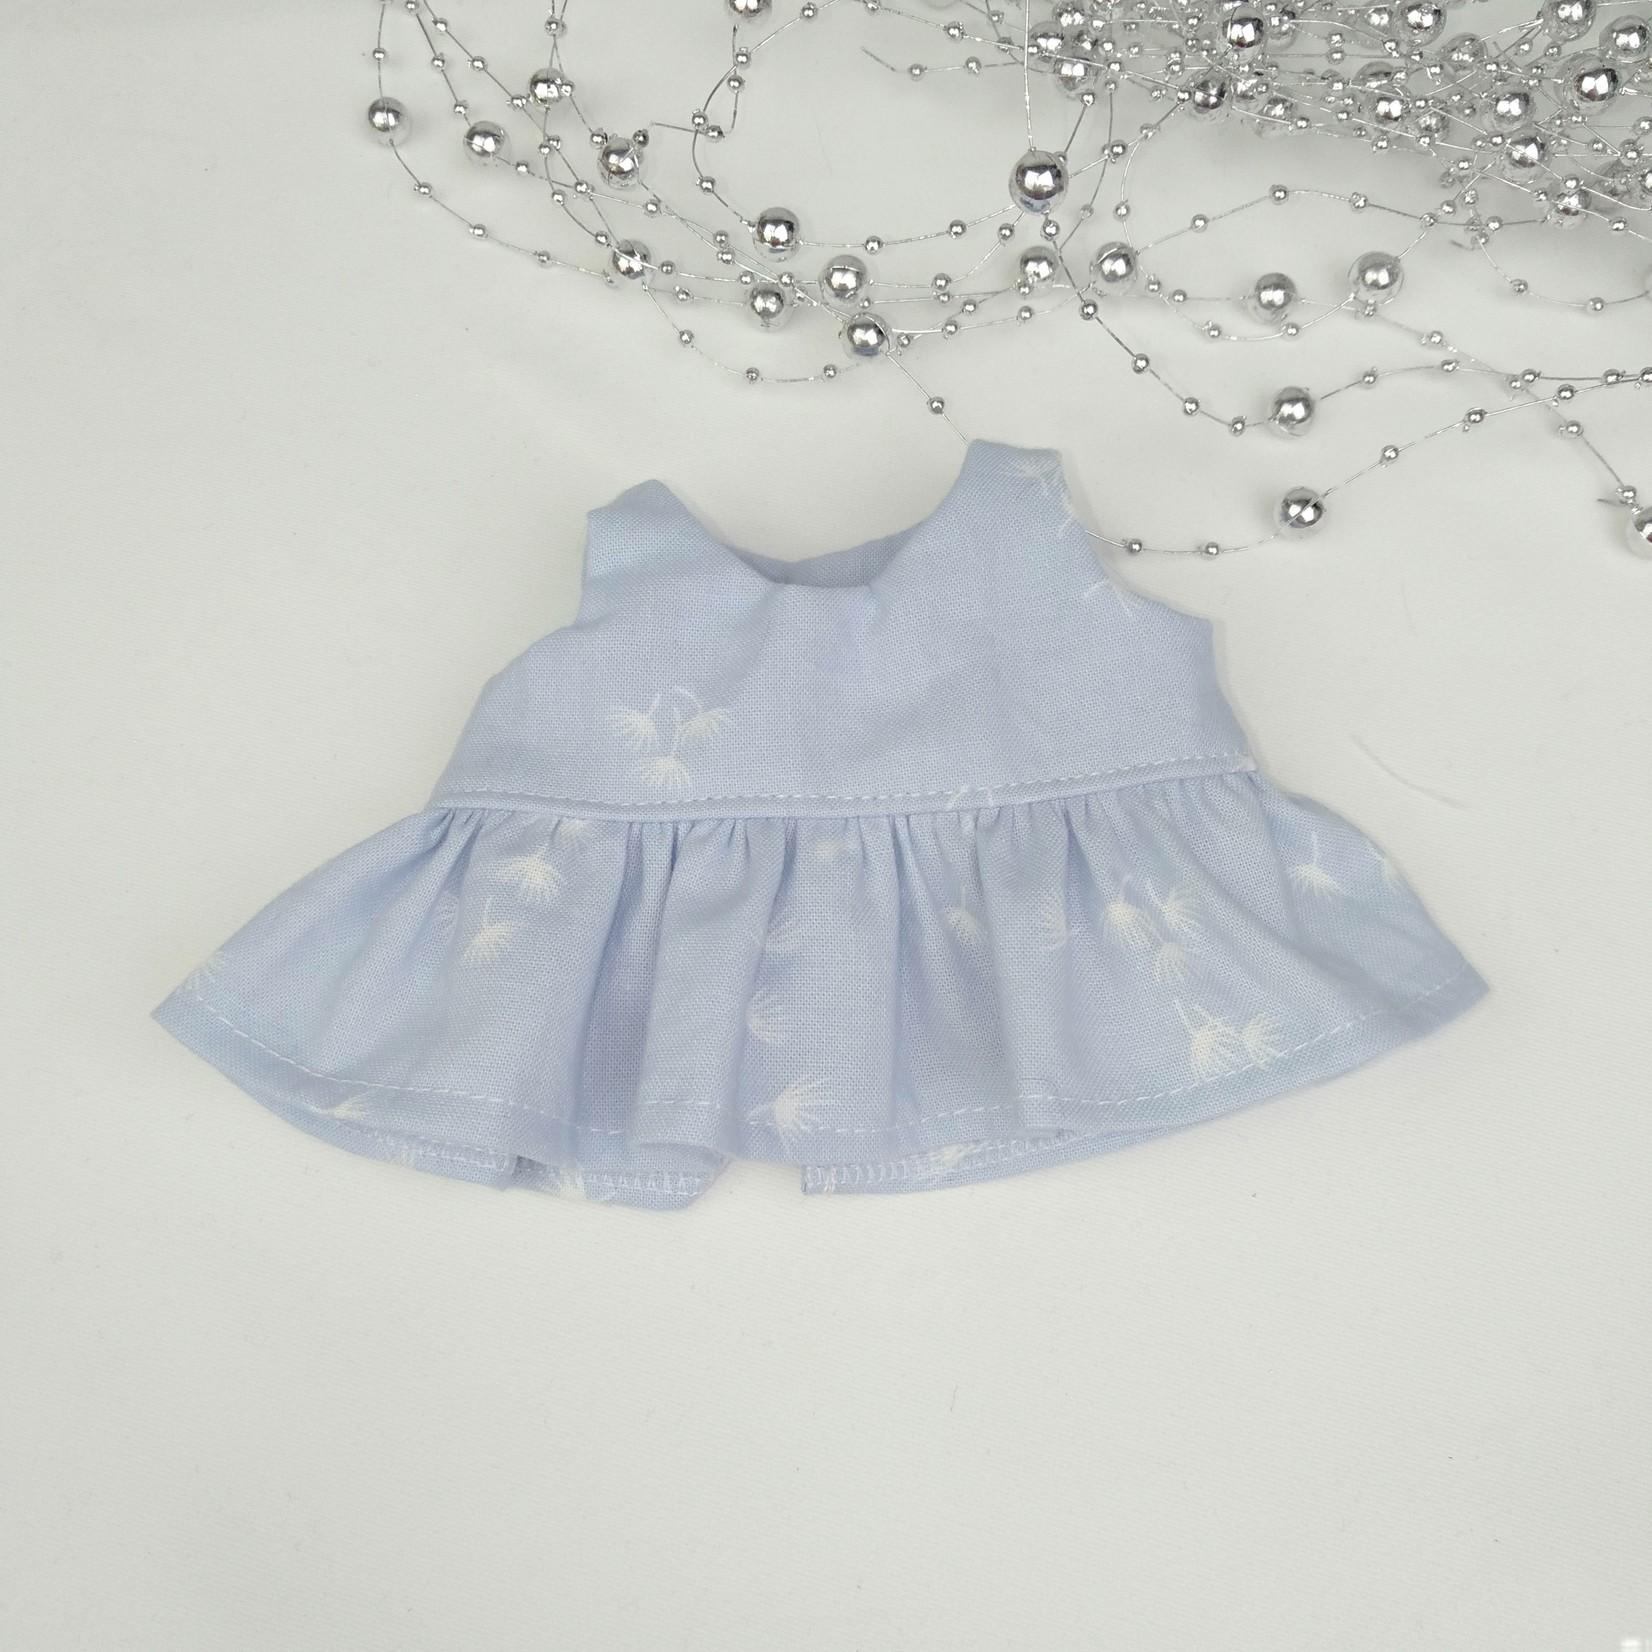 Wacky Wardrobe Wacky Wardrobe 21cm Doll Dress